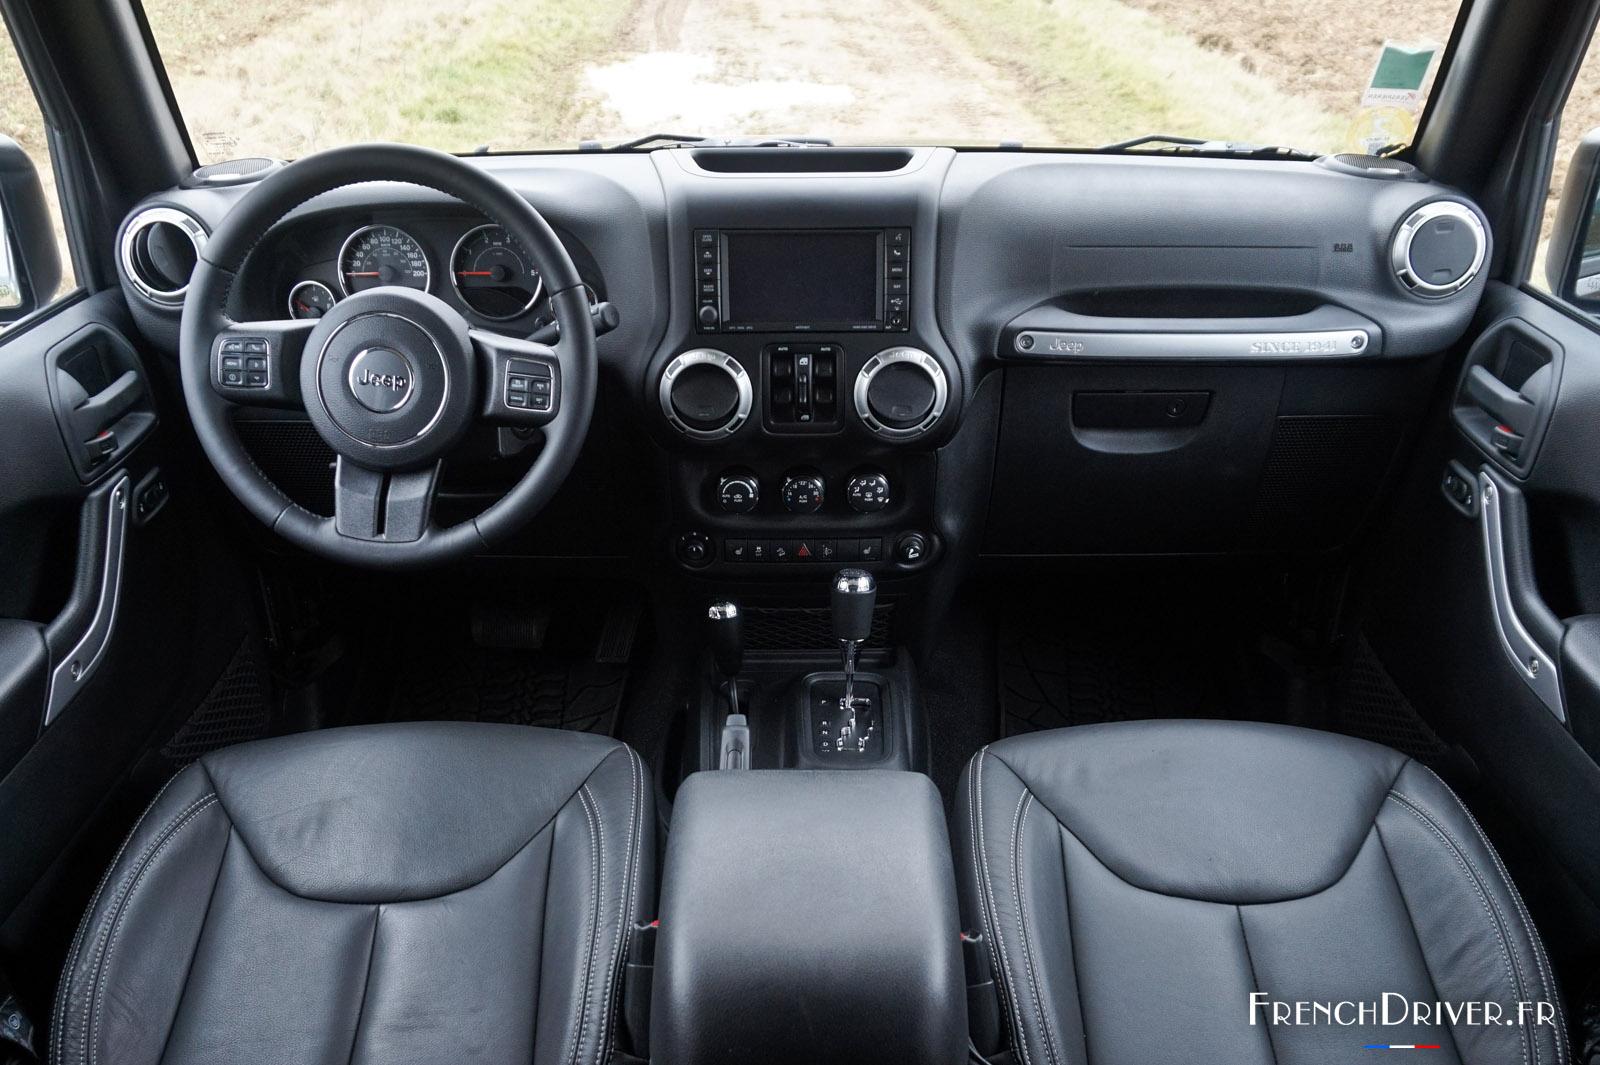 essai jeep wrangler incassable et inclassable french driver. Black Bedroom Furniture Sets. Home Design Ideas